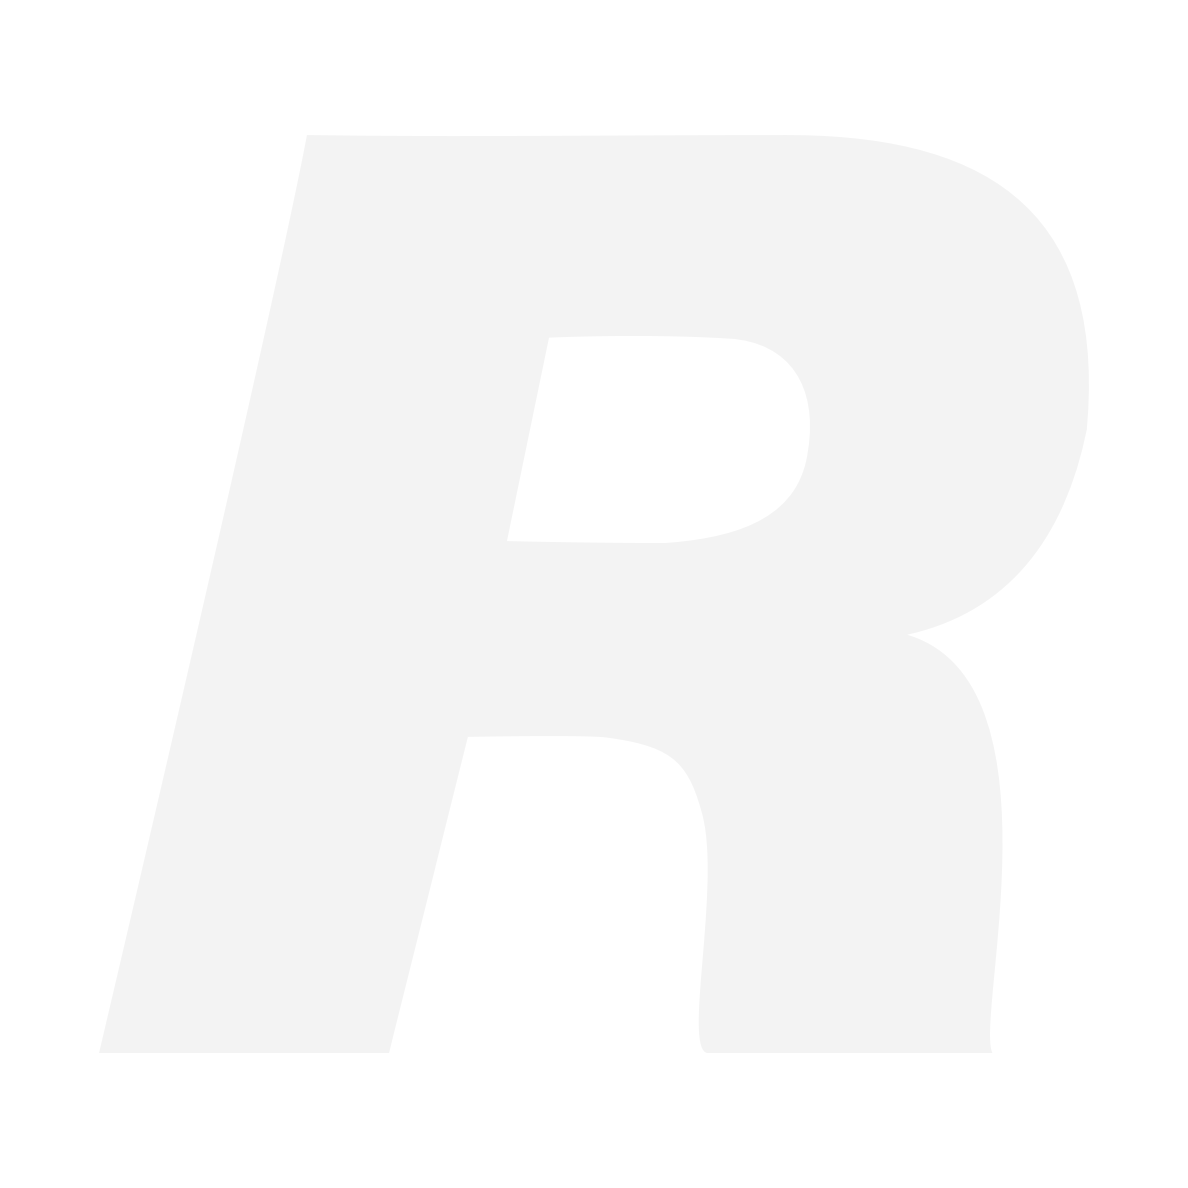 DJI Mavic Air ND Filter Set (ND4/8/16)